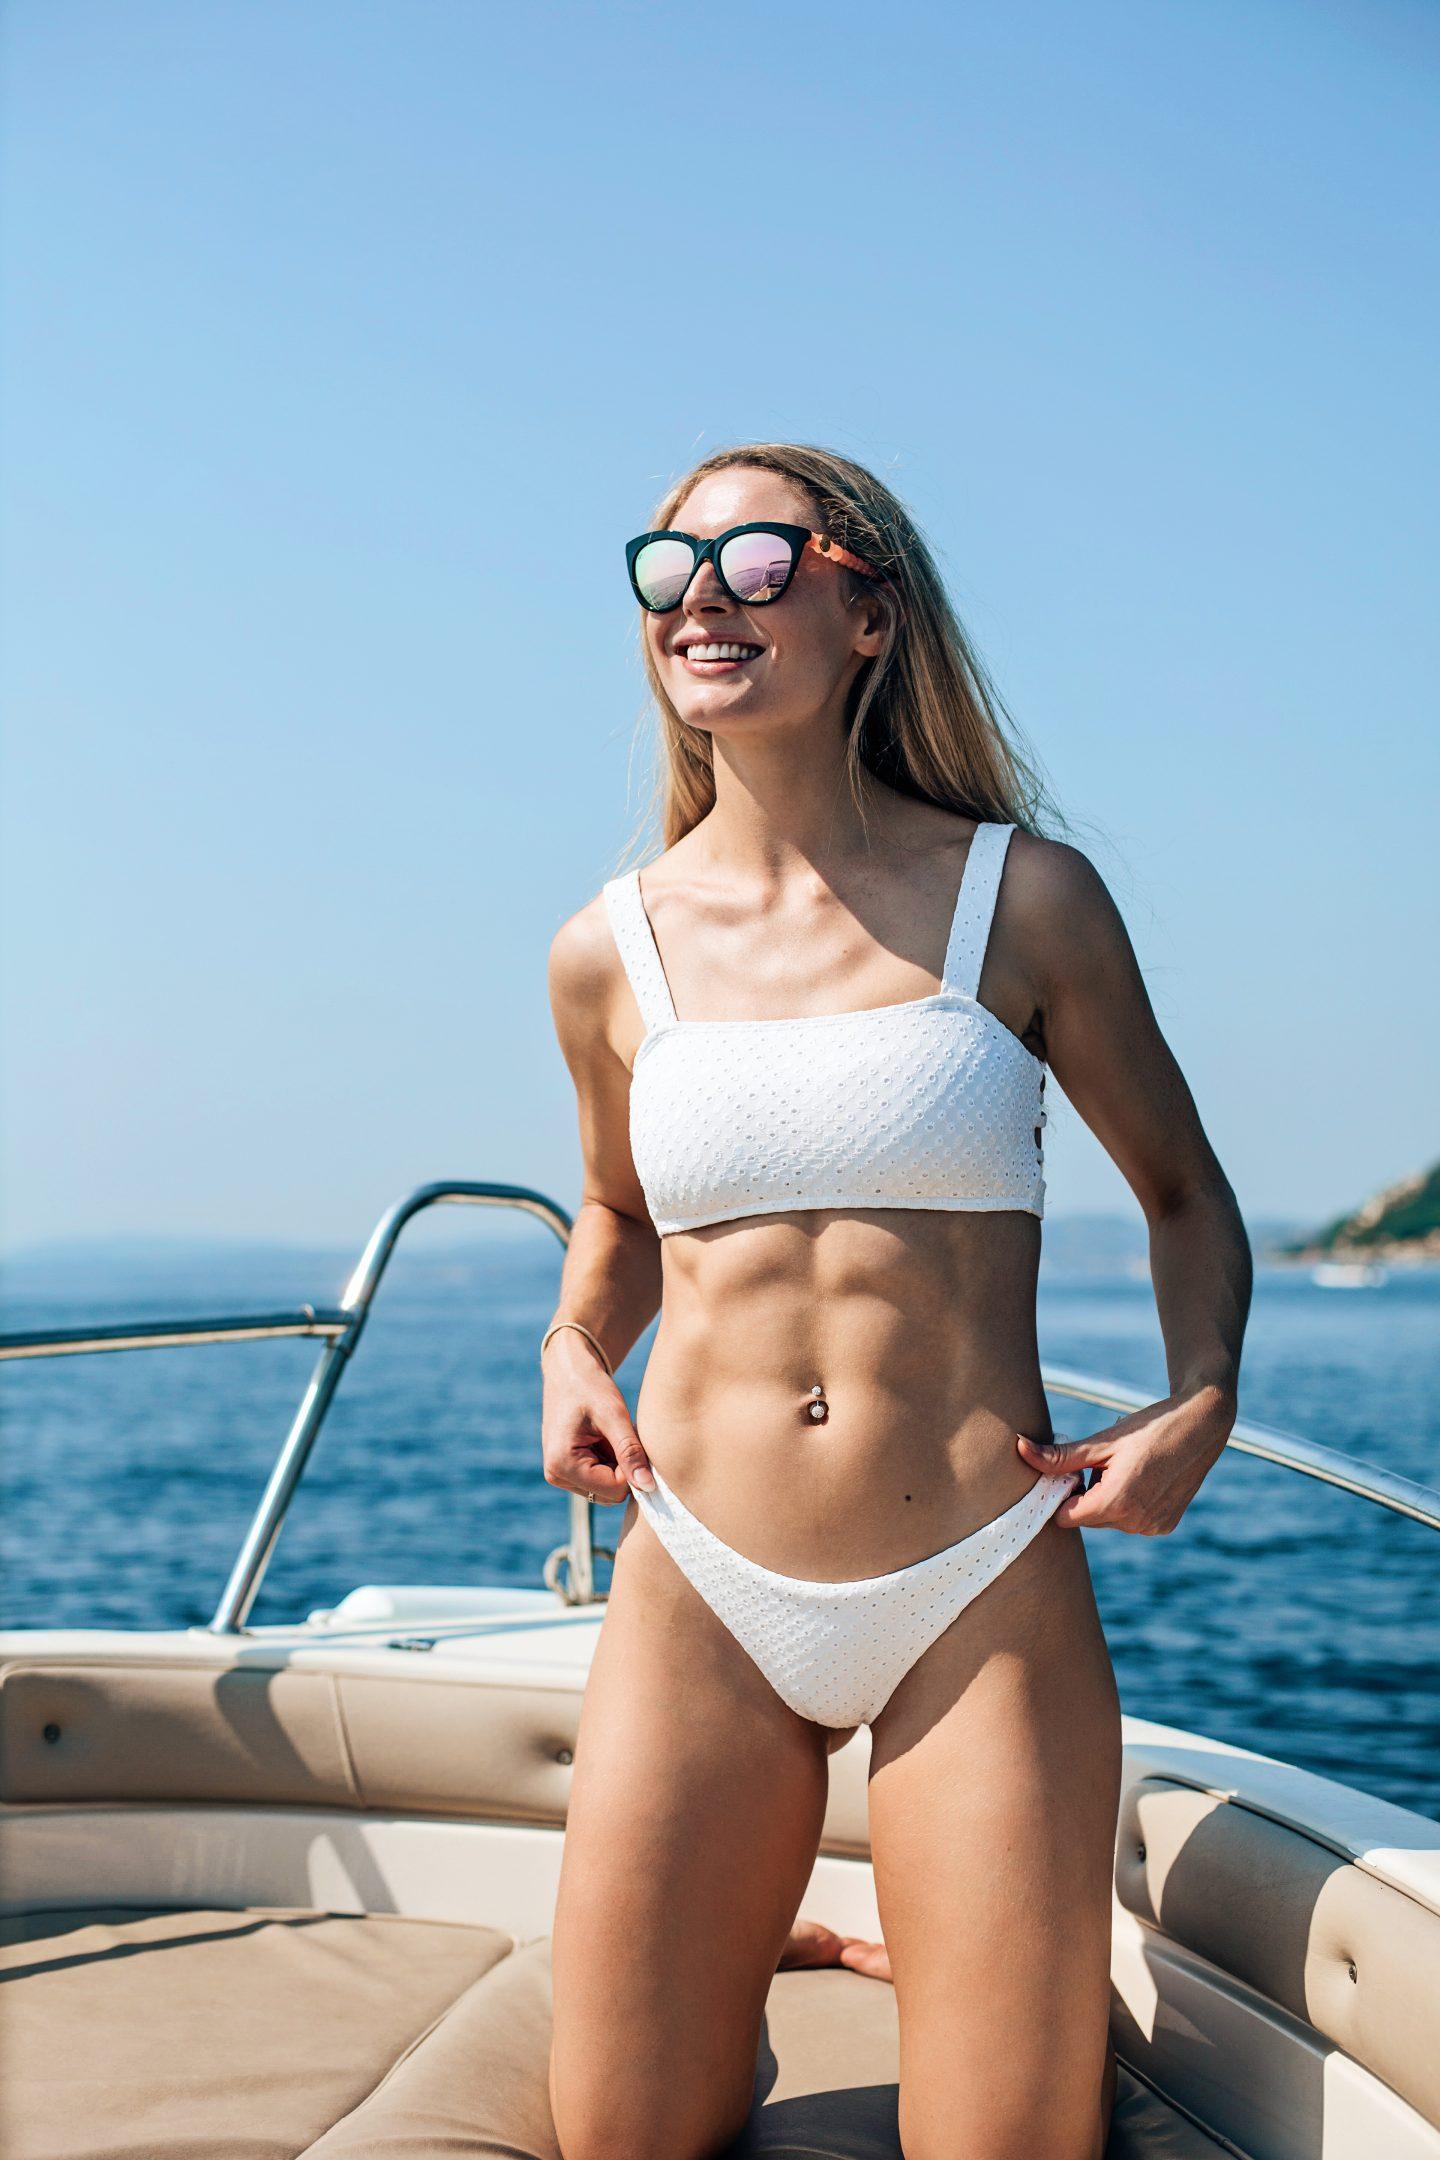 White bikini by PilyQ, and mirrored sunglasses by Brass & Unity